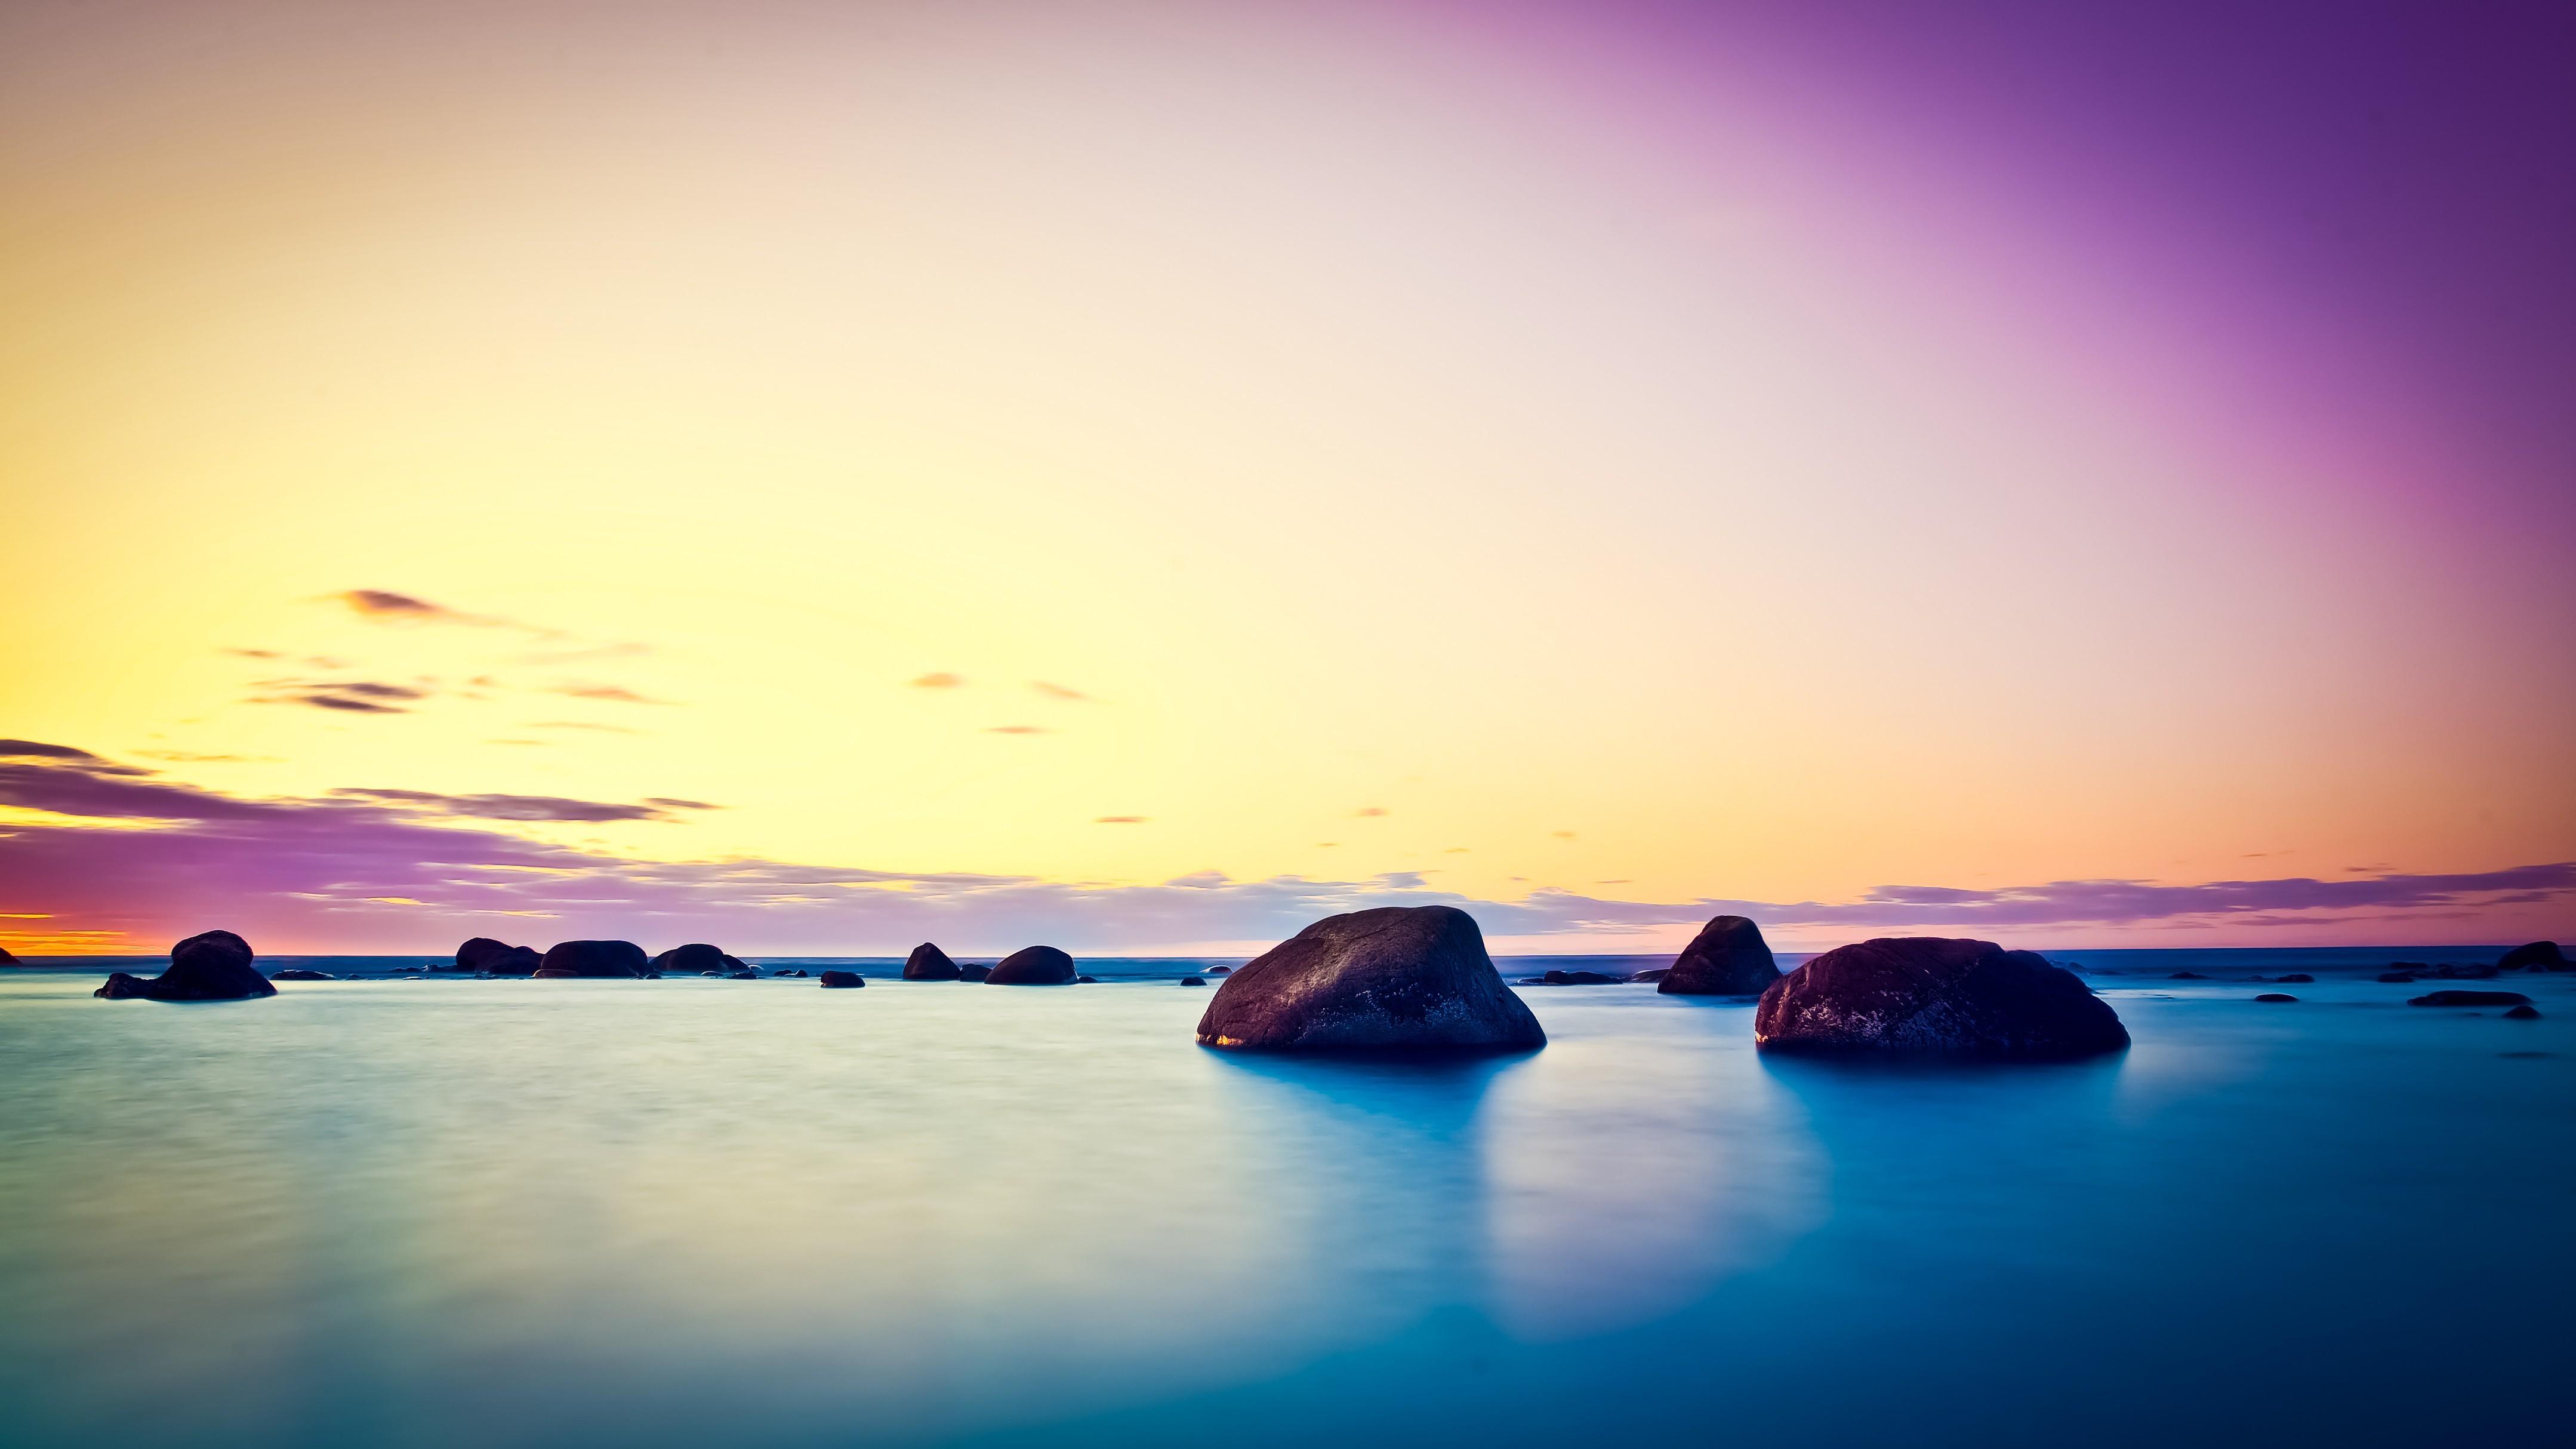 Море океан фото